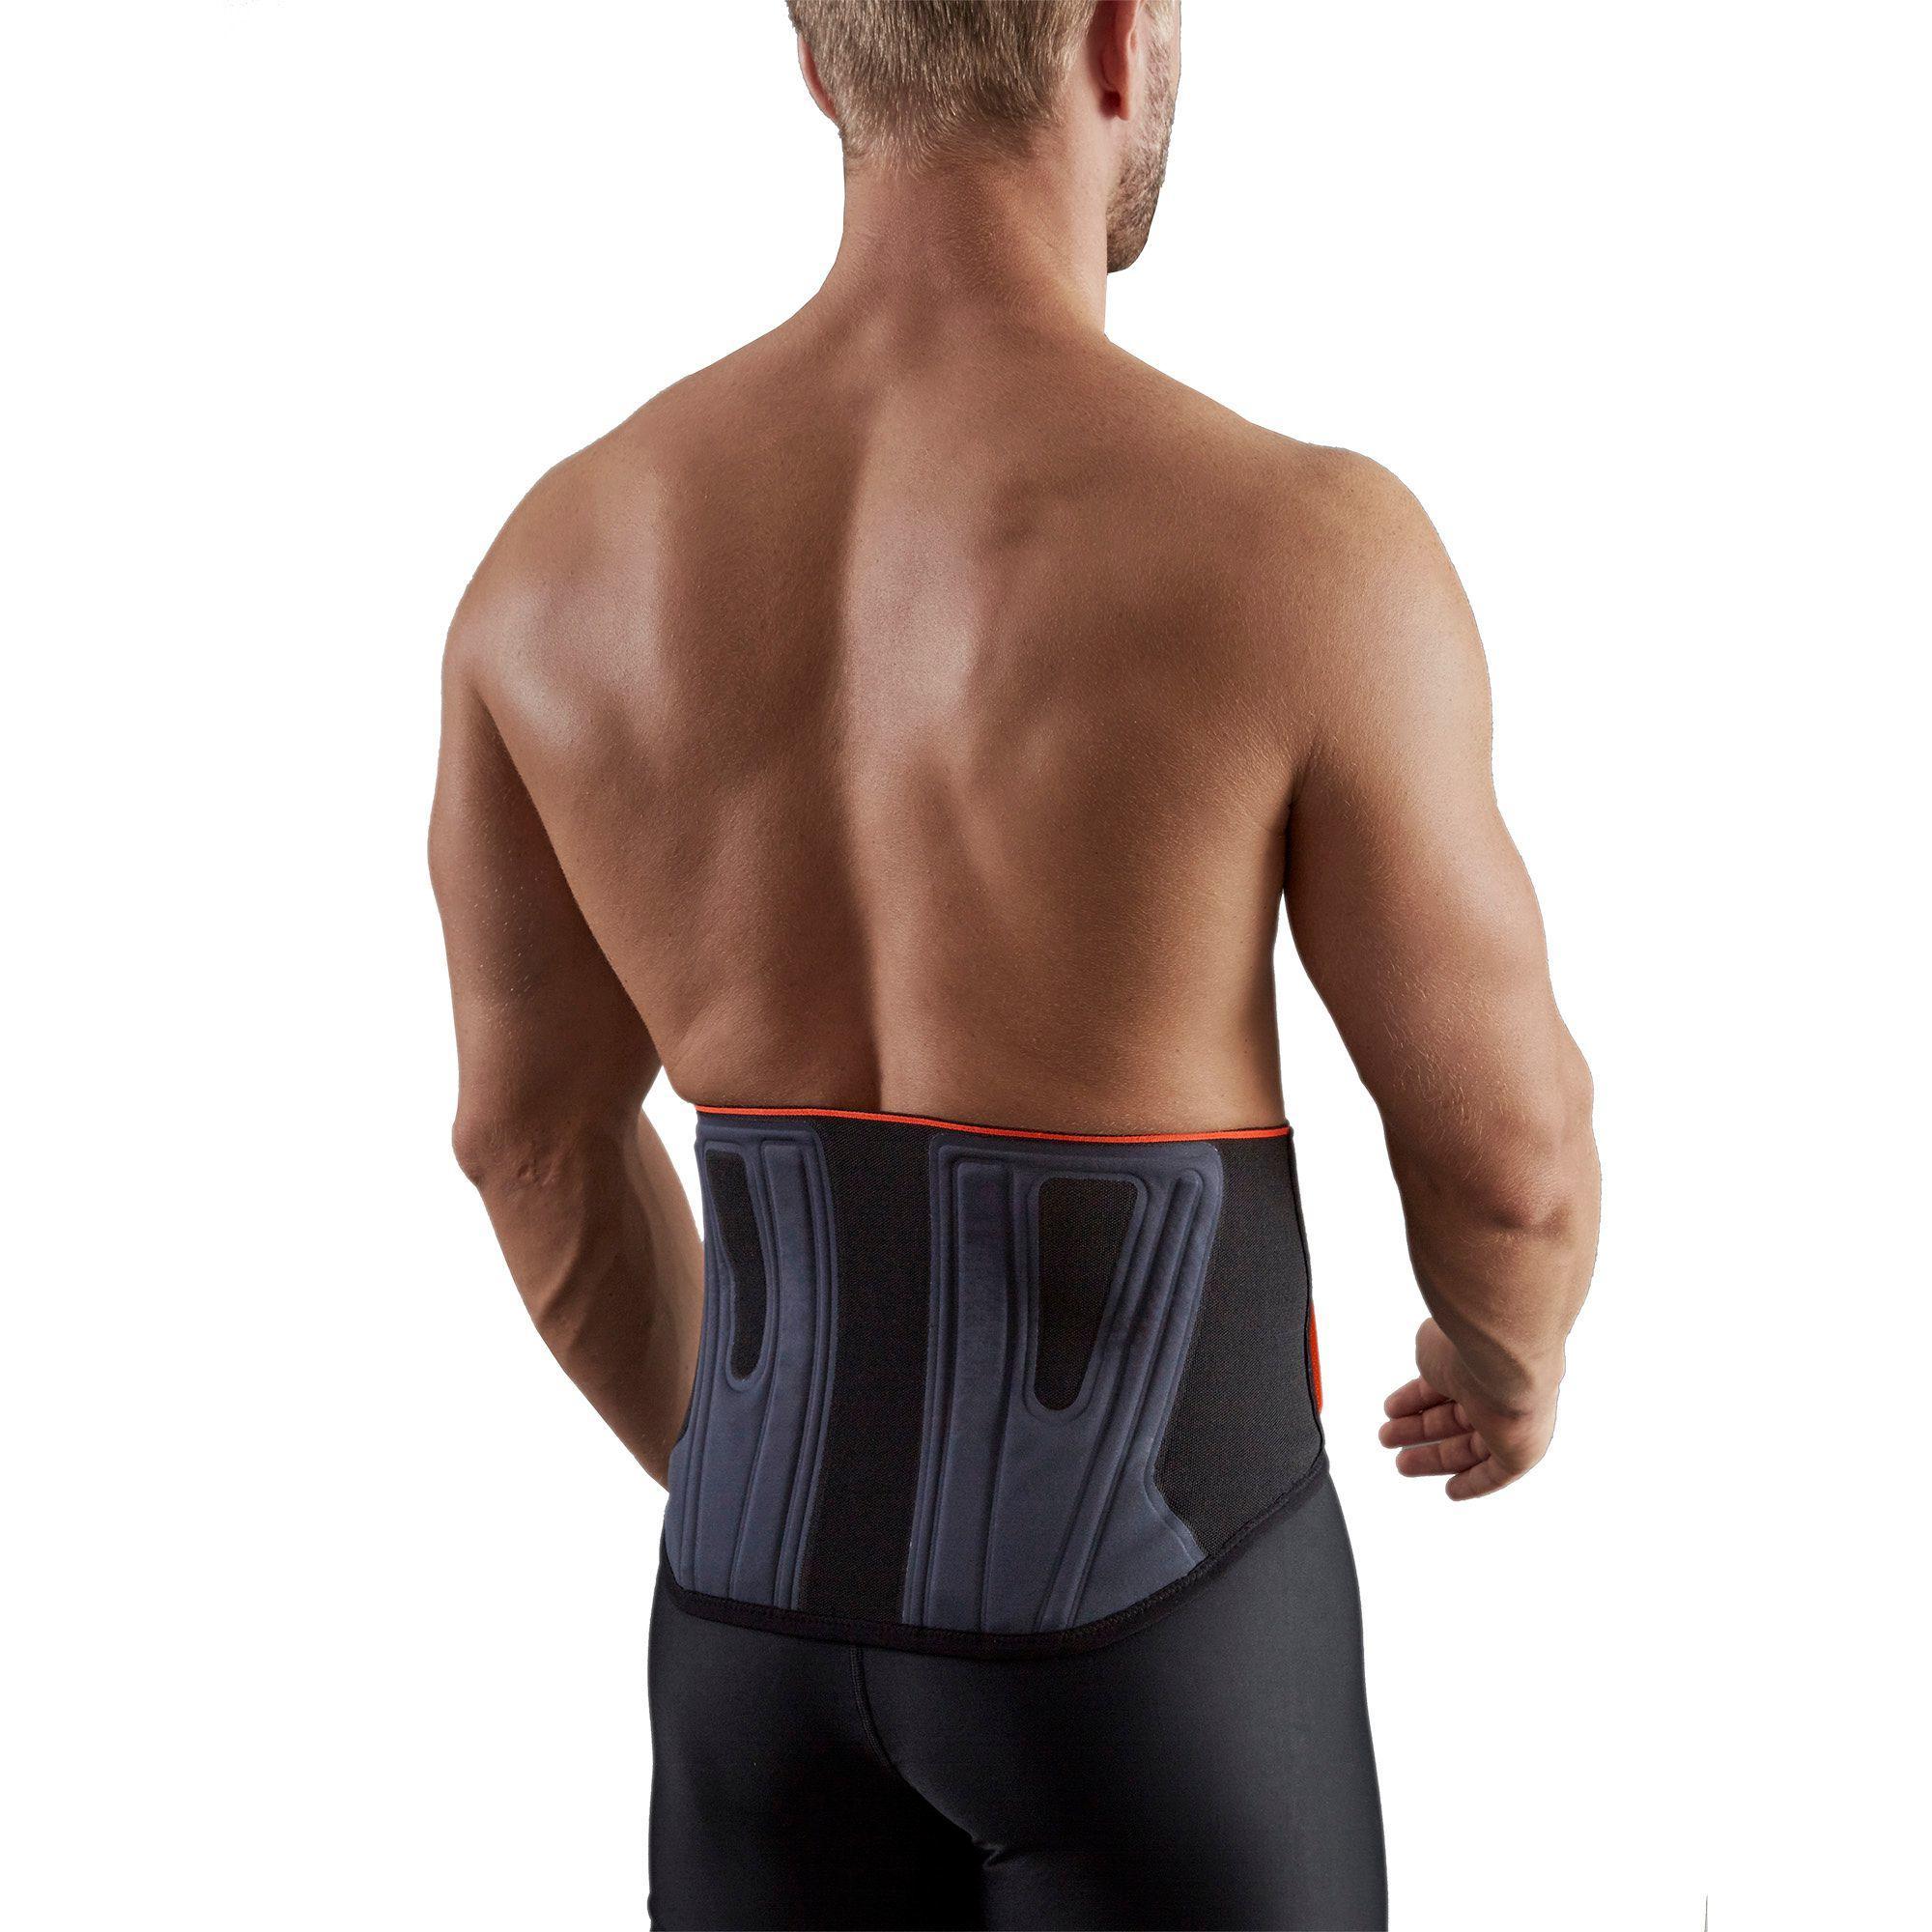 Soft 300 Men's/Women's Supportive Lumbar Brace - Black